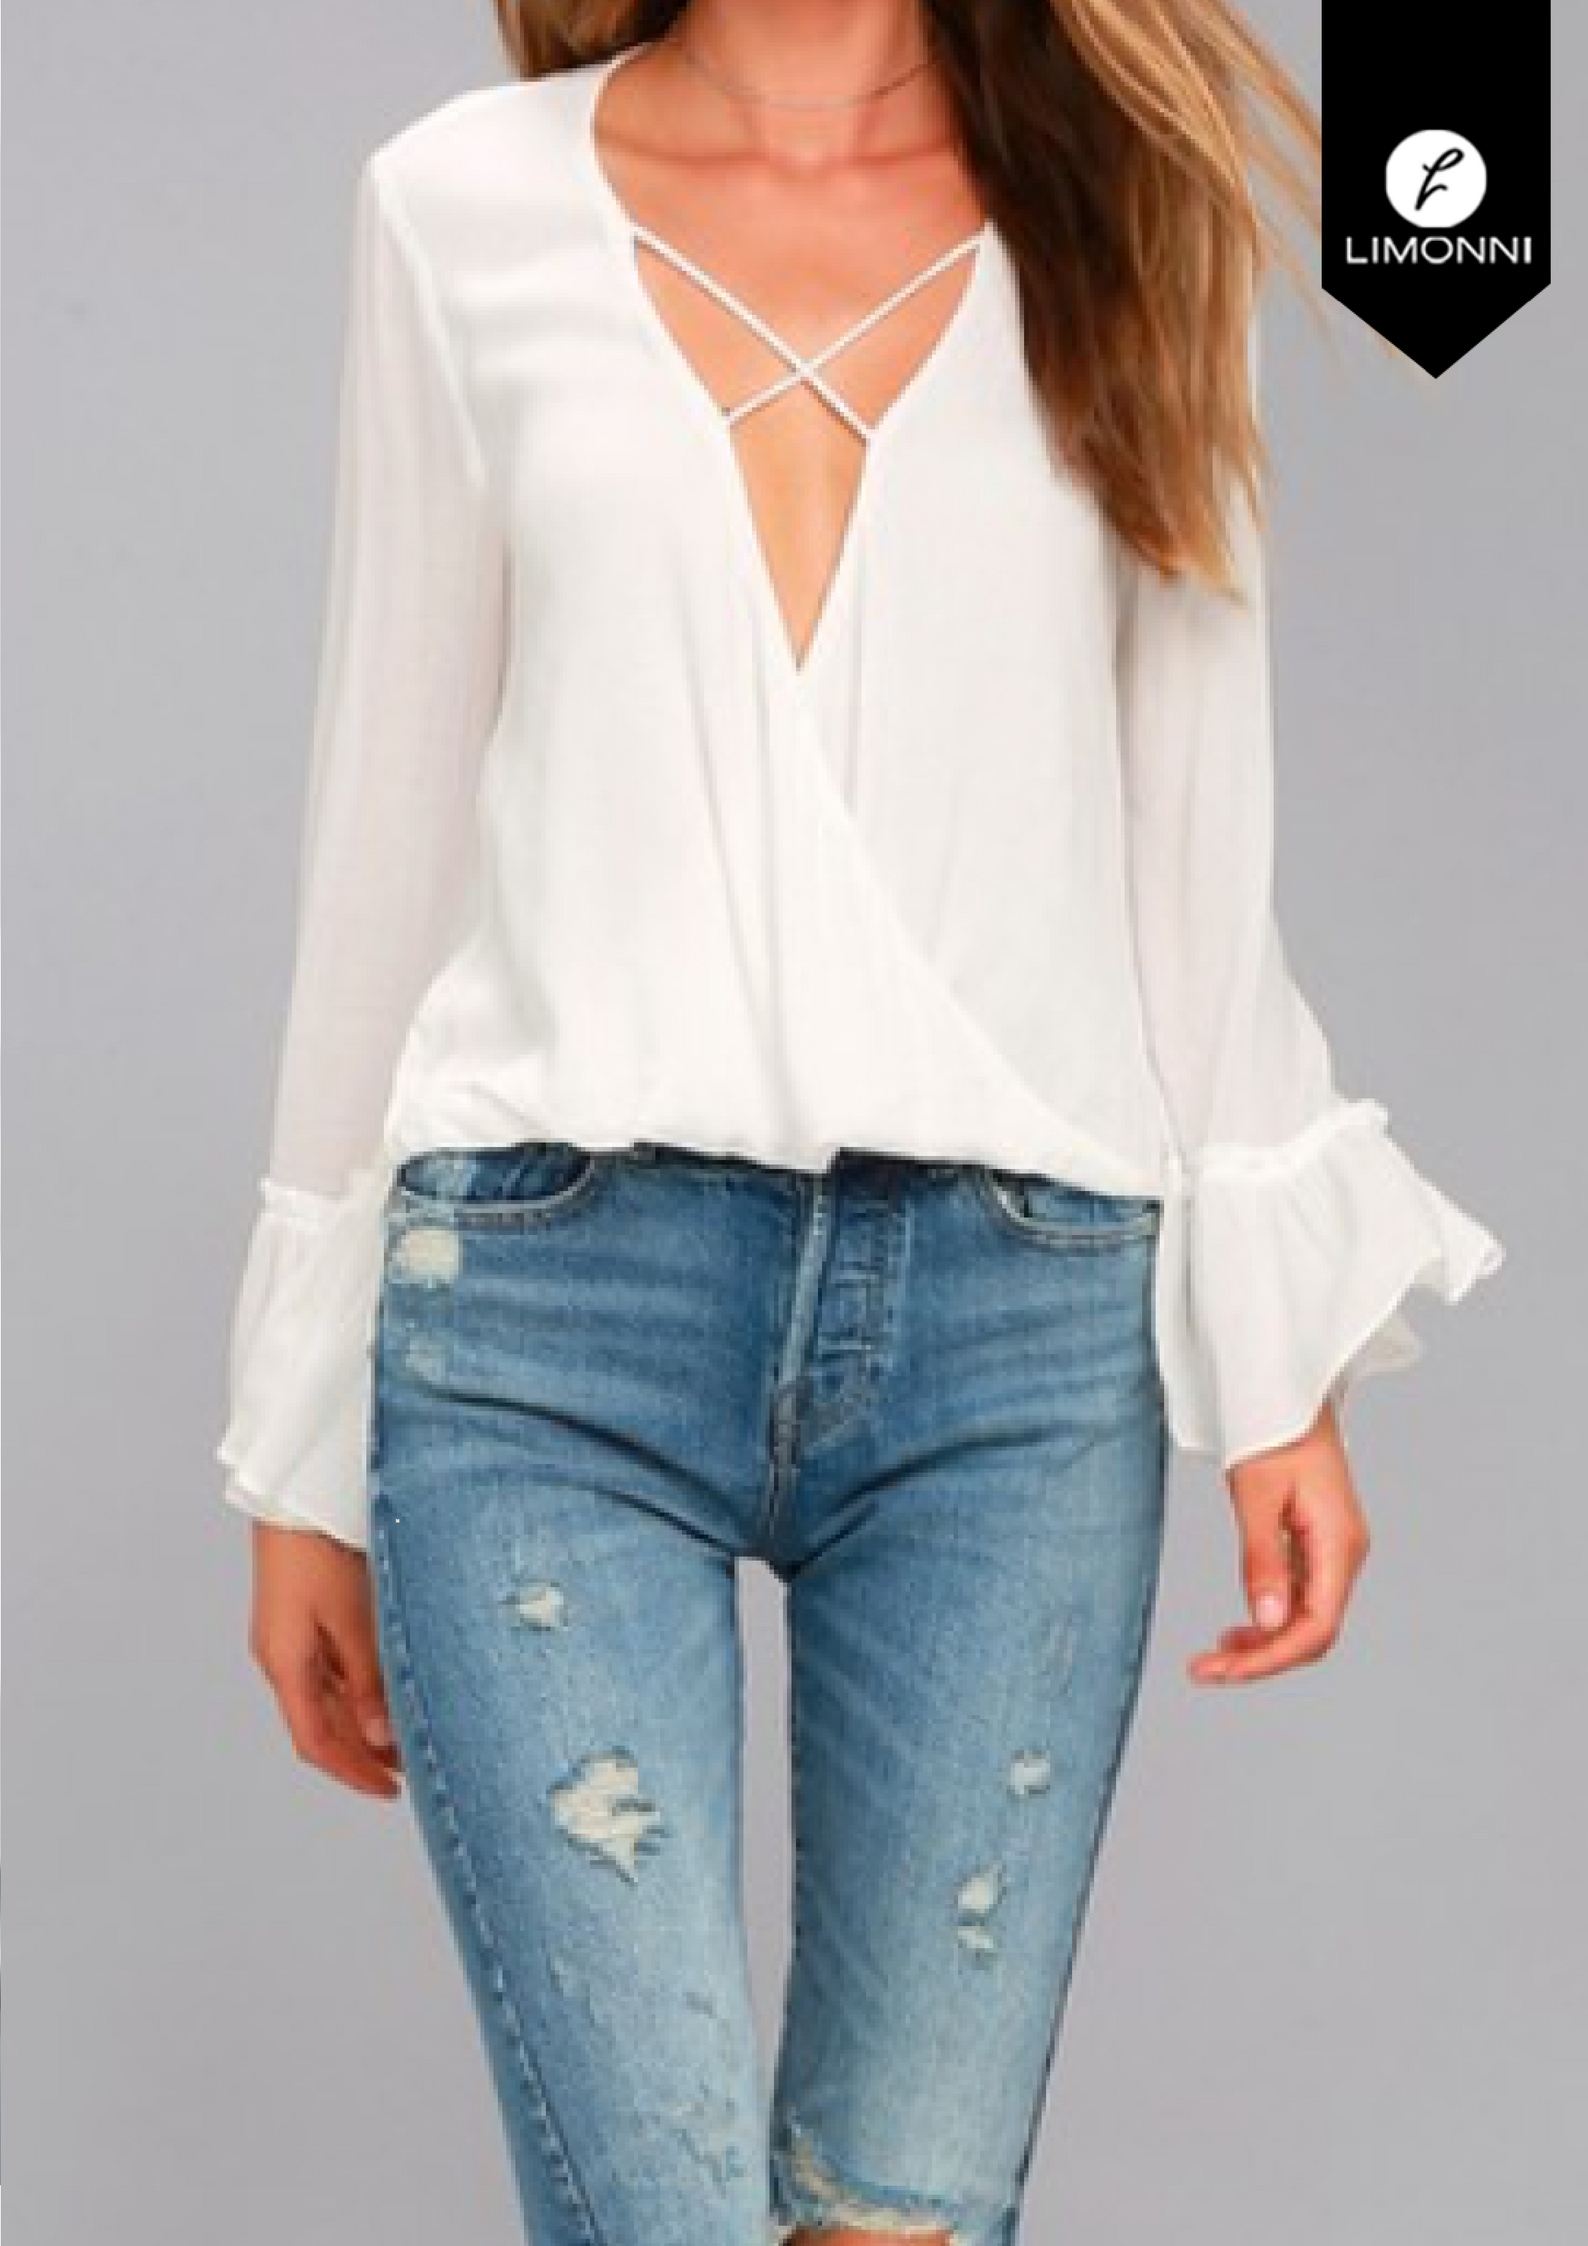 Blusas para mujer Limonni Bennett LI1376 Casuales